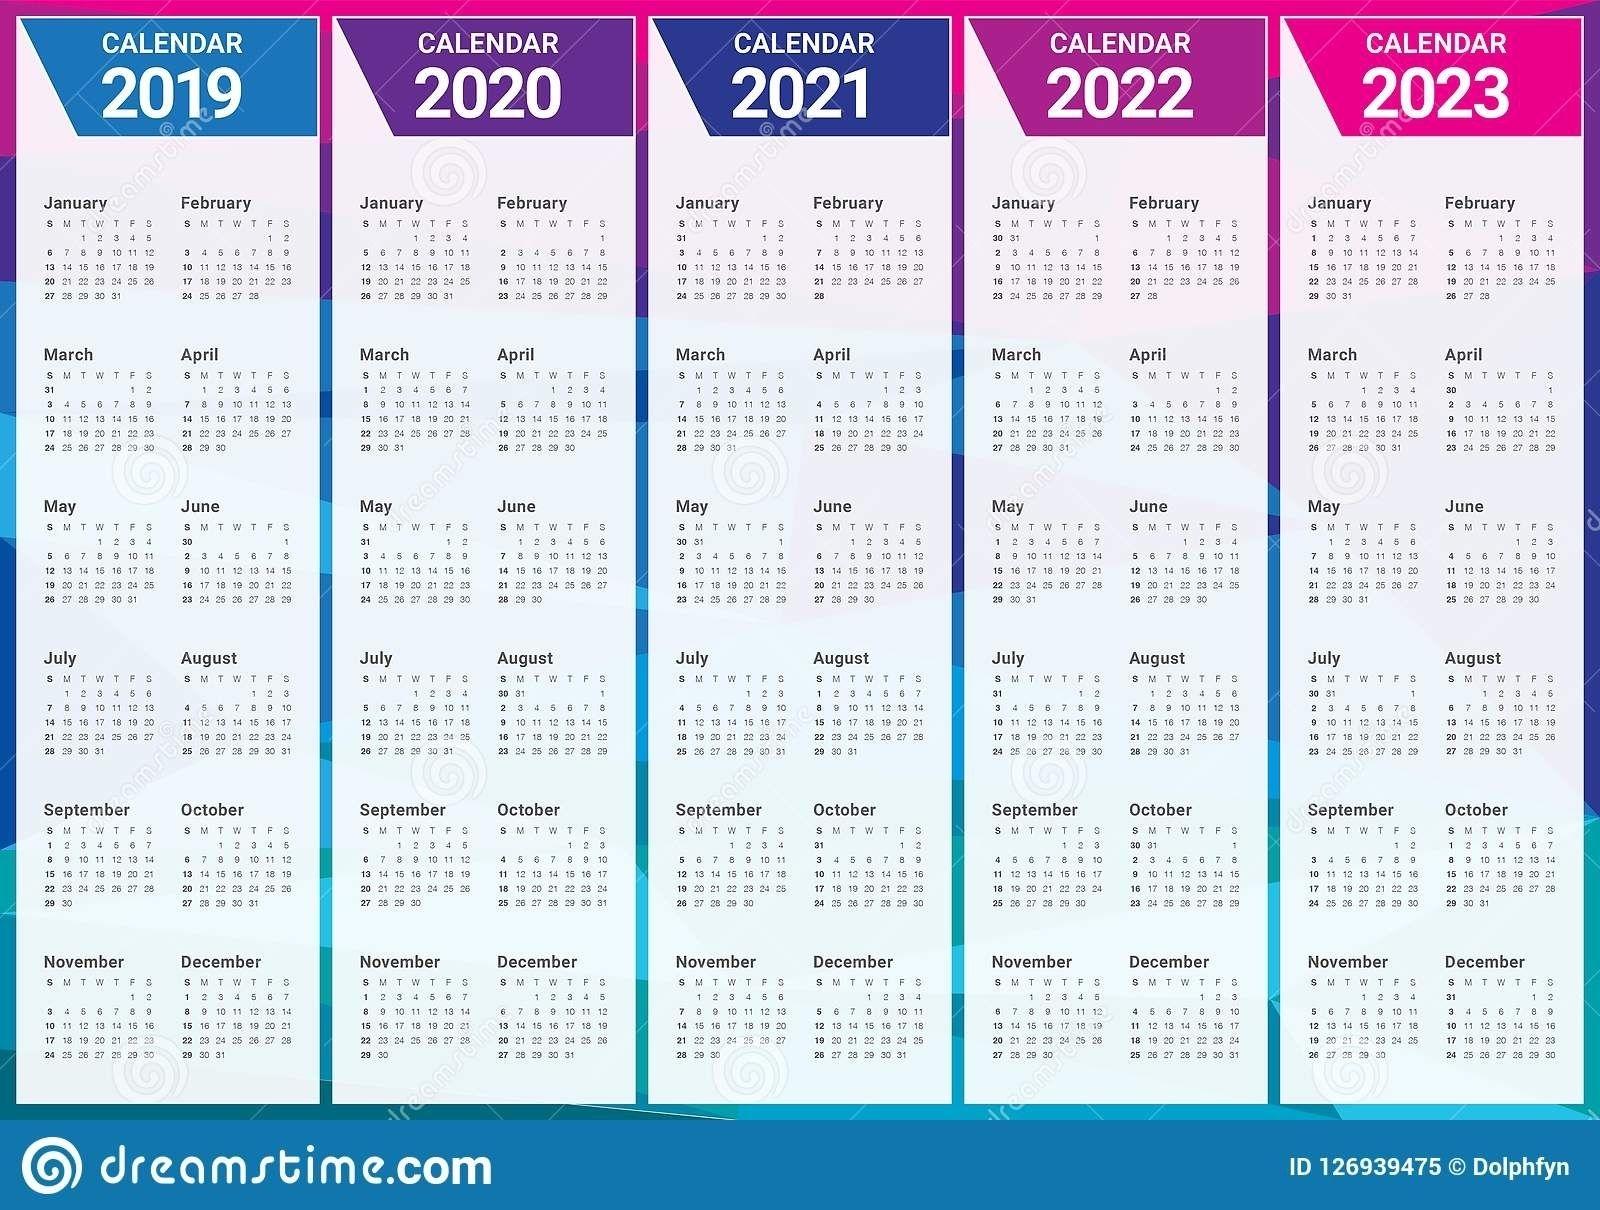 2021 2022 2023 Downloadable Calendar | Ten Free Printable